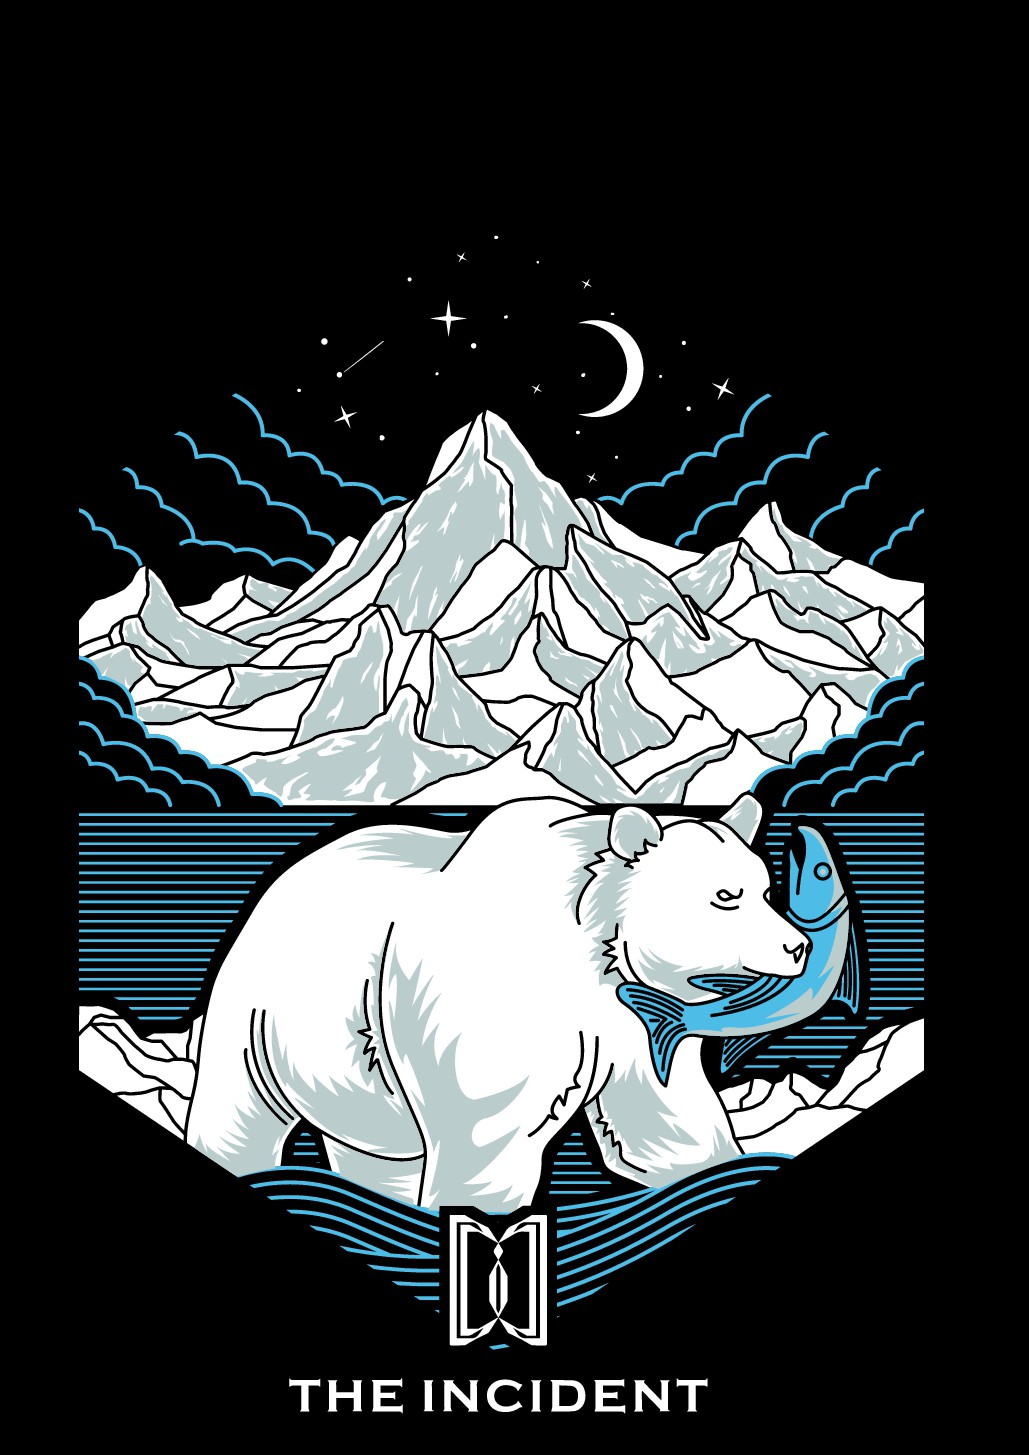 Design for clothing brand (endangered animals design).